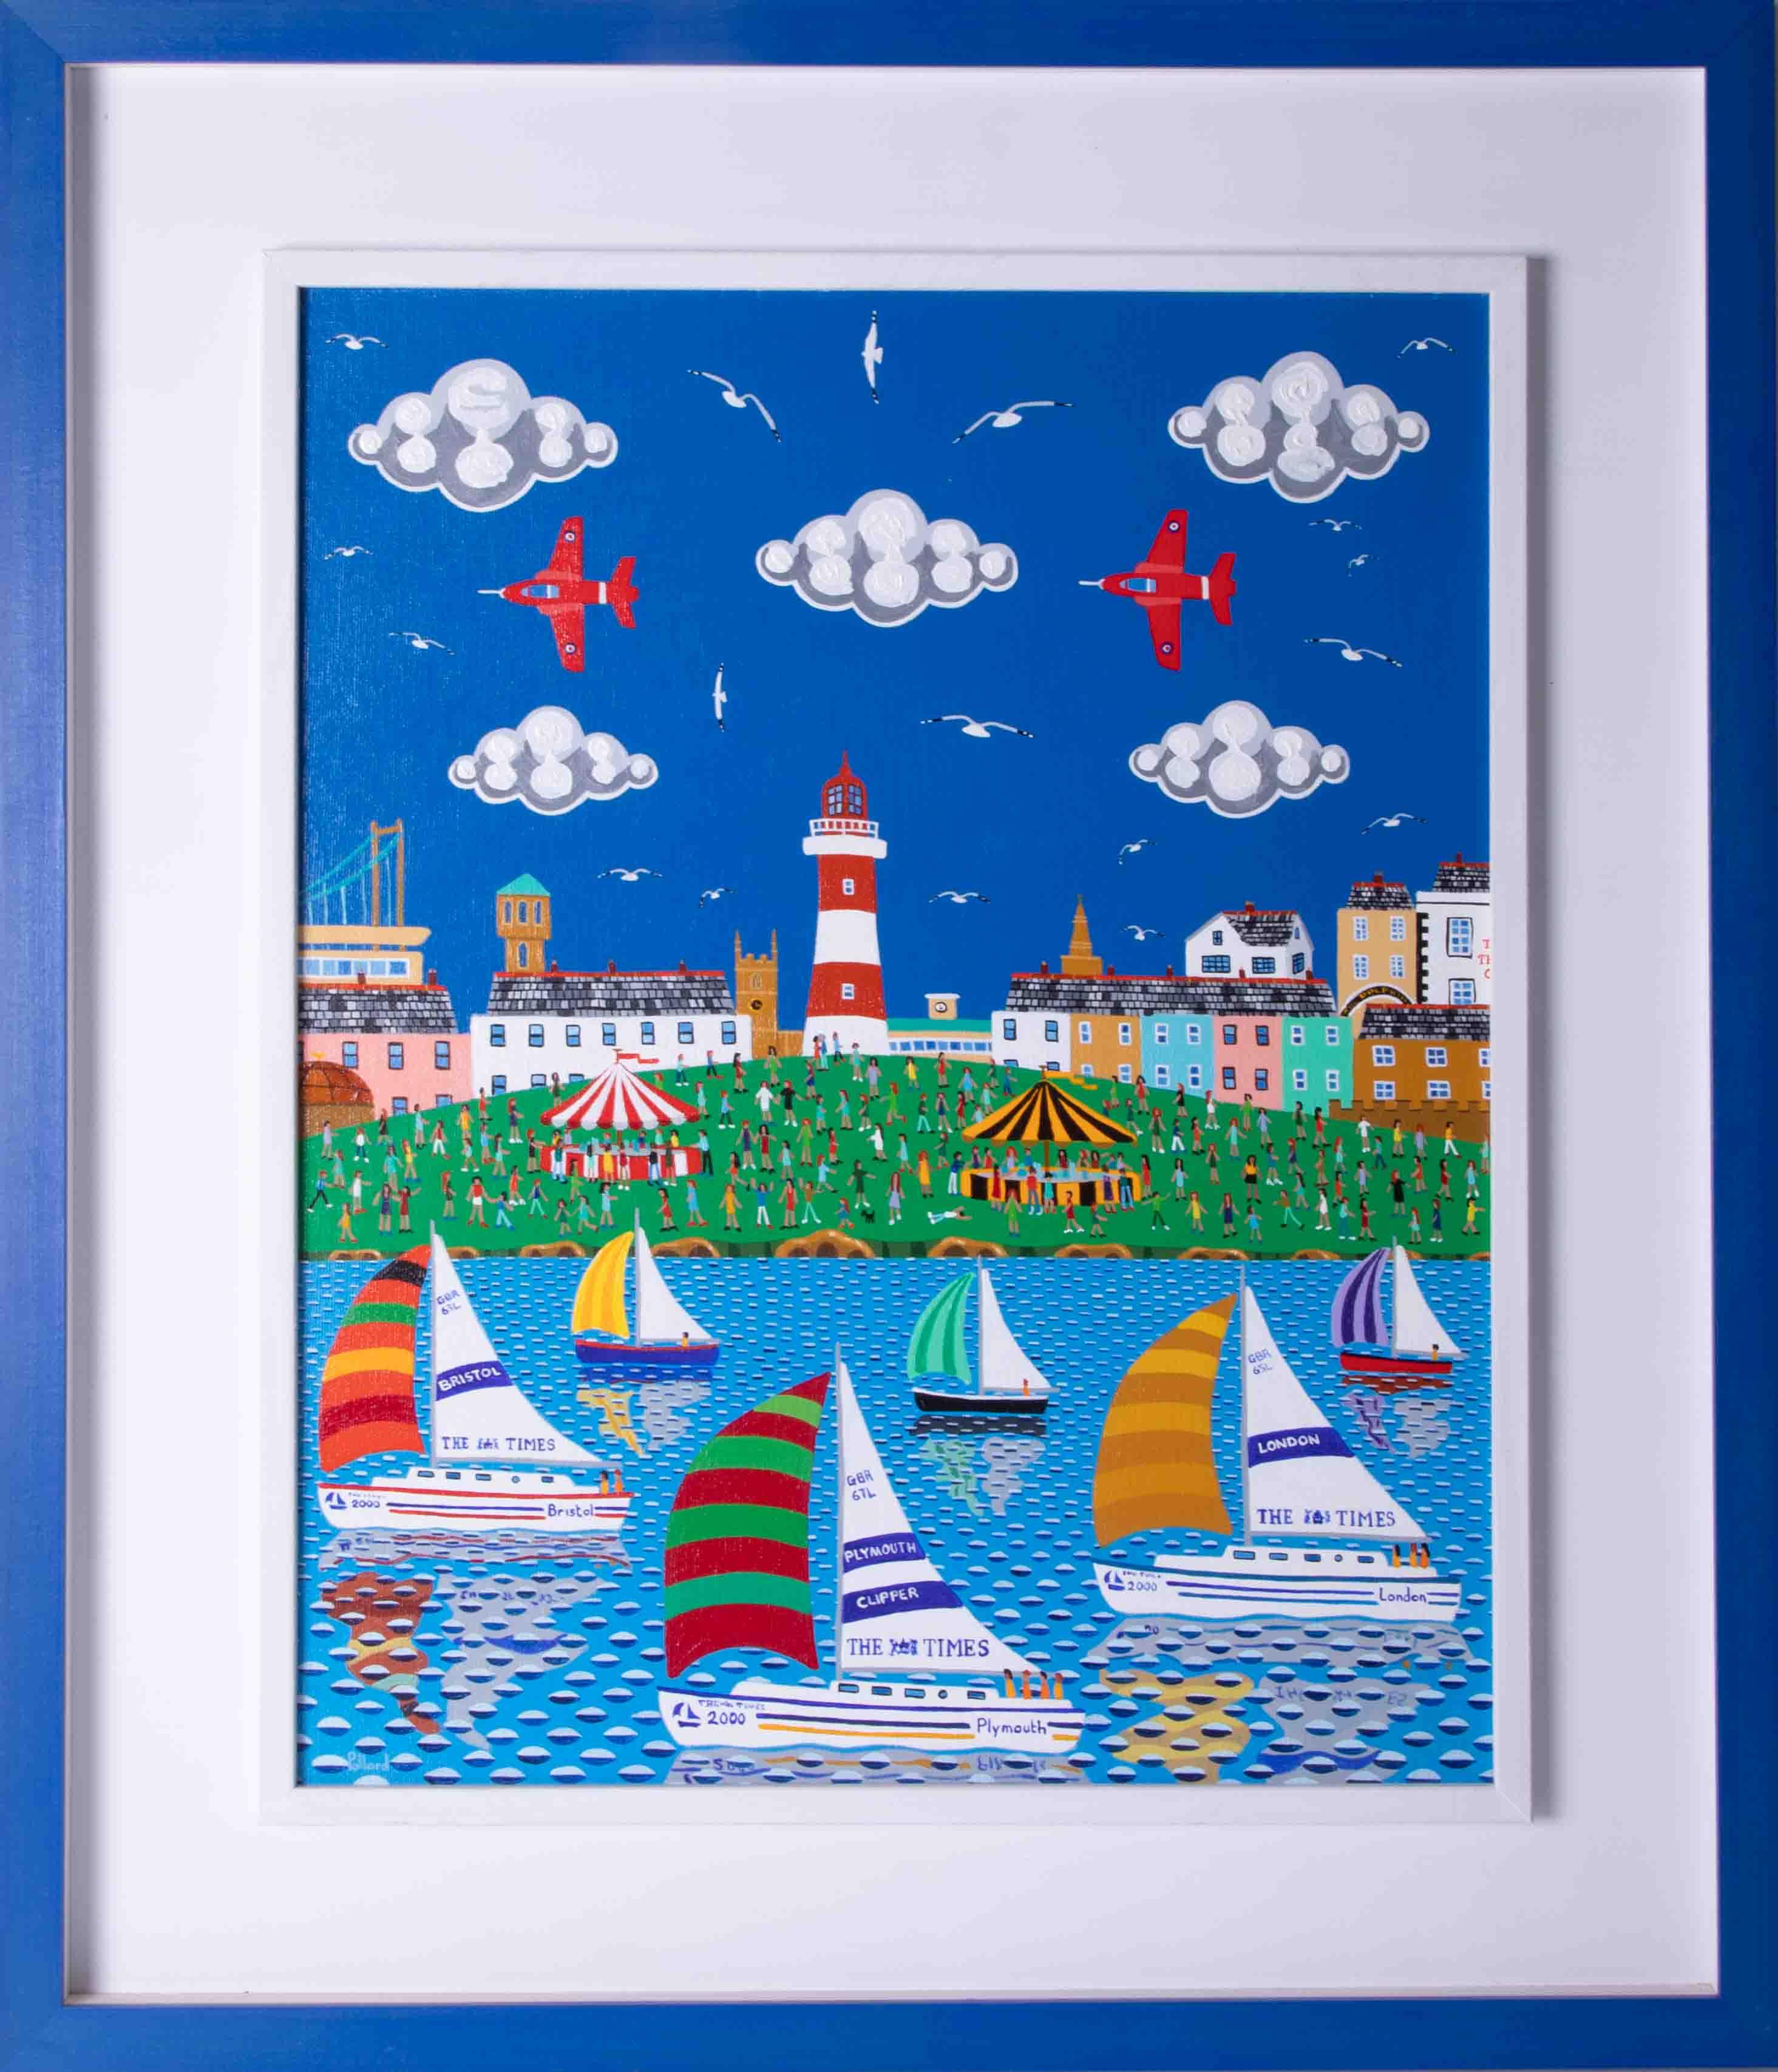 Brian Pollard, 'Red Arrows' acrylic on board, signed, 50cm x 39cm, framed. Brian is a member of